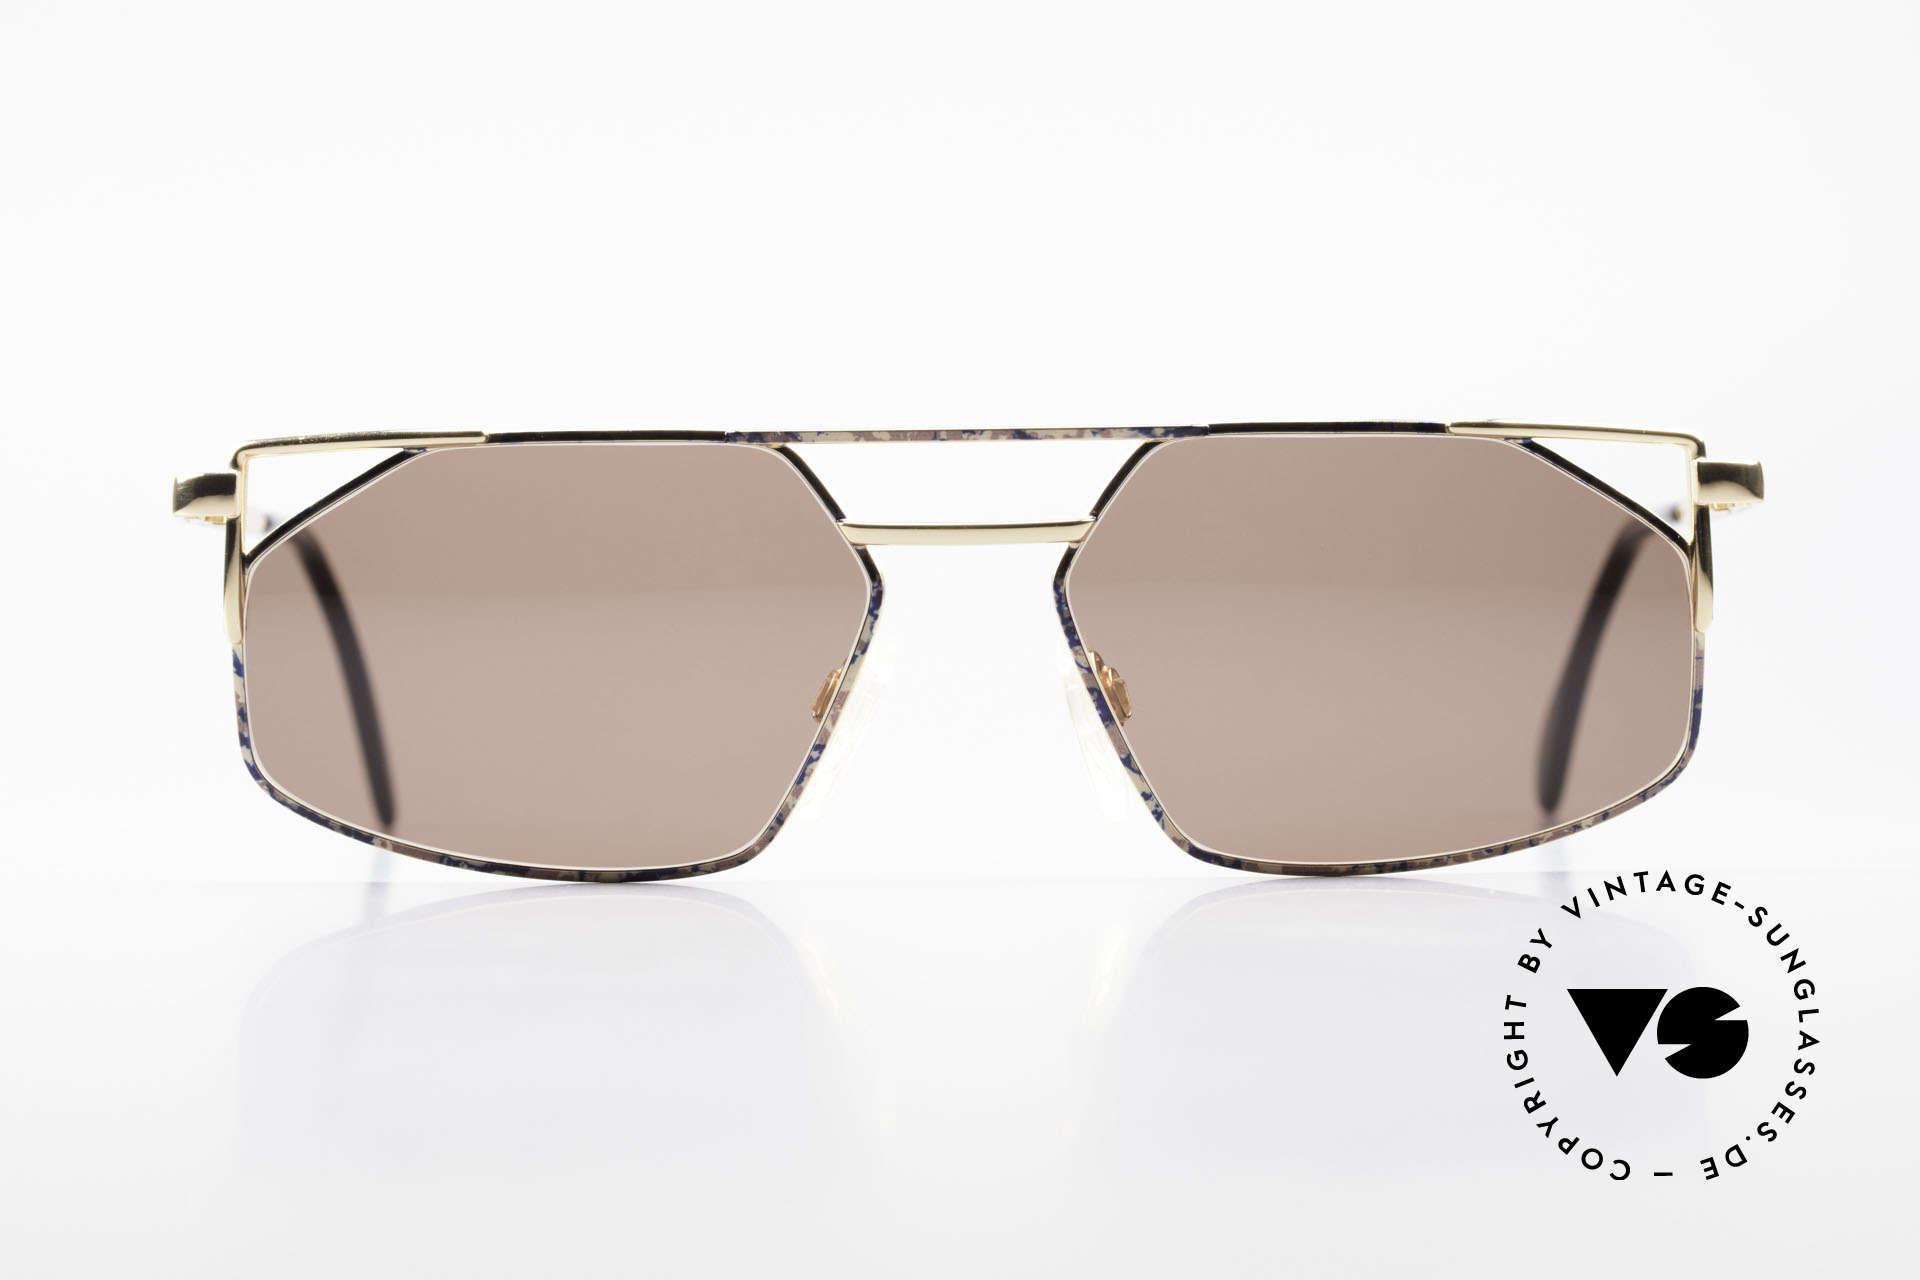 Cazal 751 Rare 90's Designer Sunglasses, angled metal designer frame with high-grade finish, Made for Men